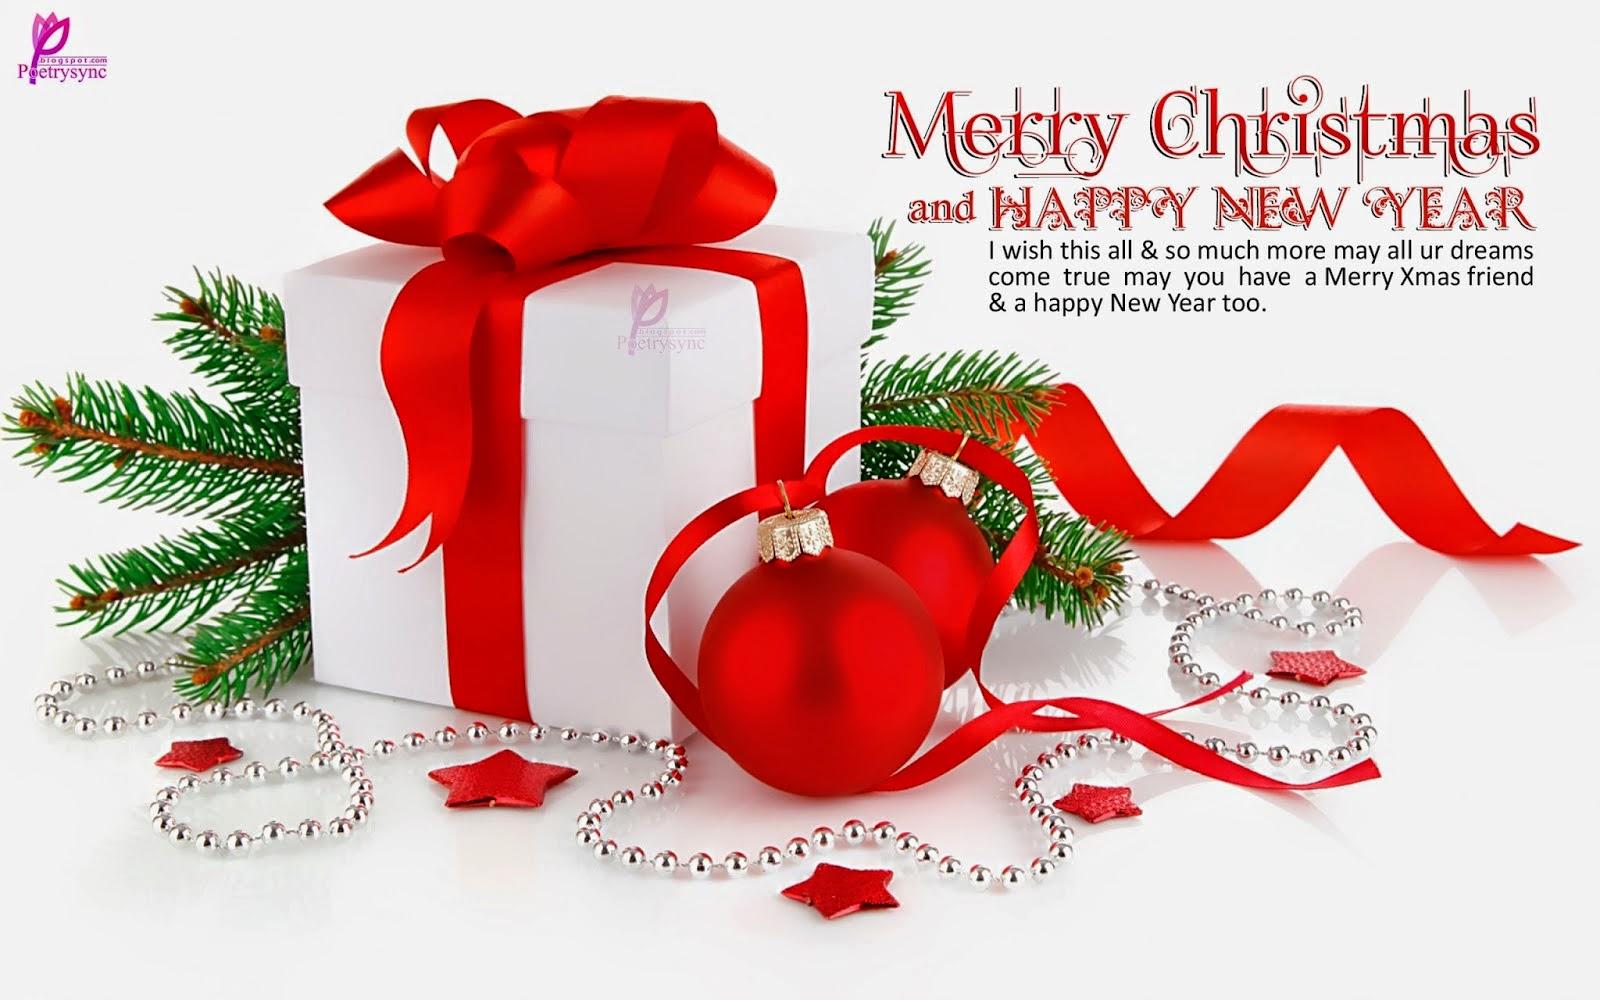 merry-christmas-free-hd-wallpaper